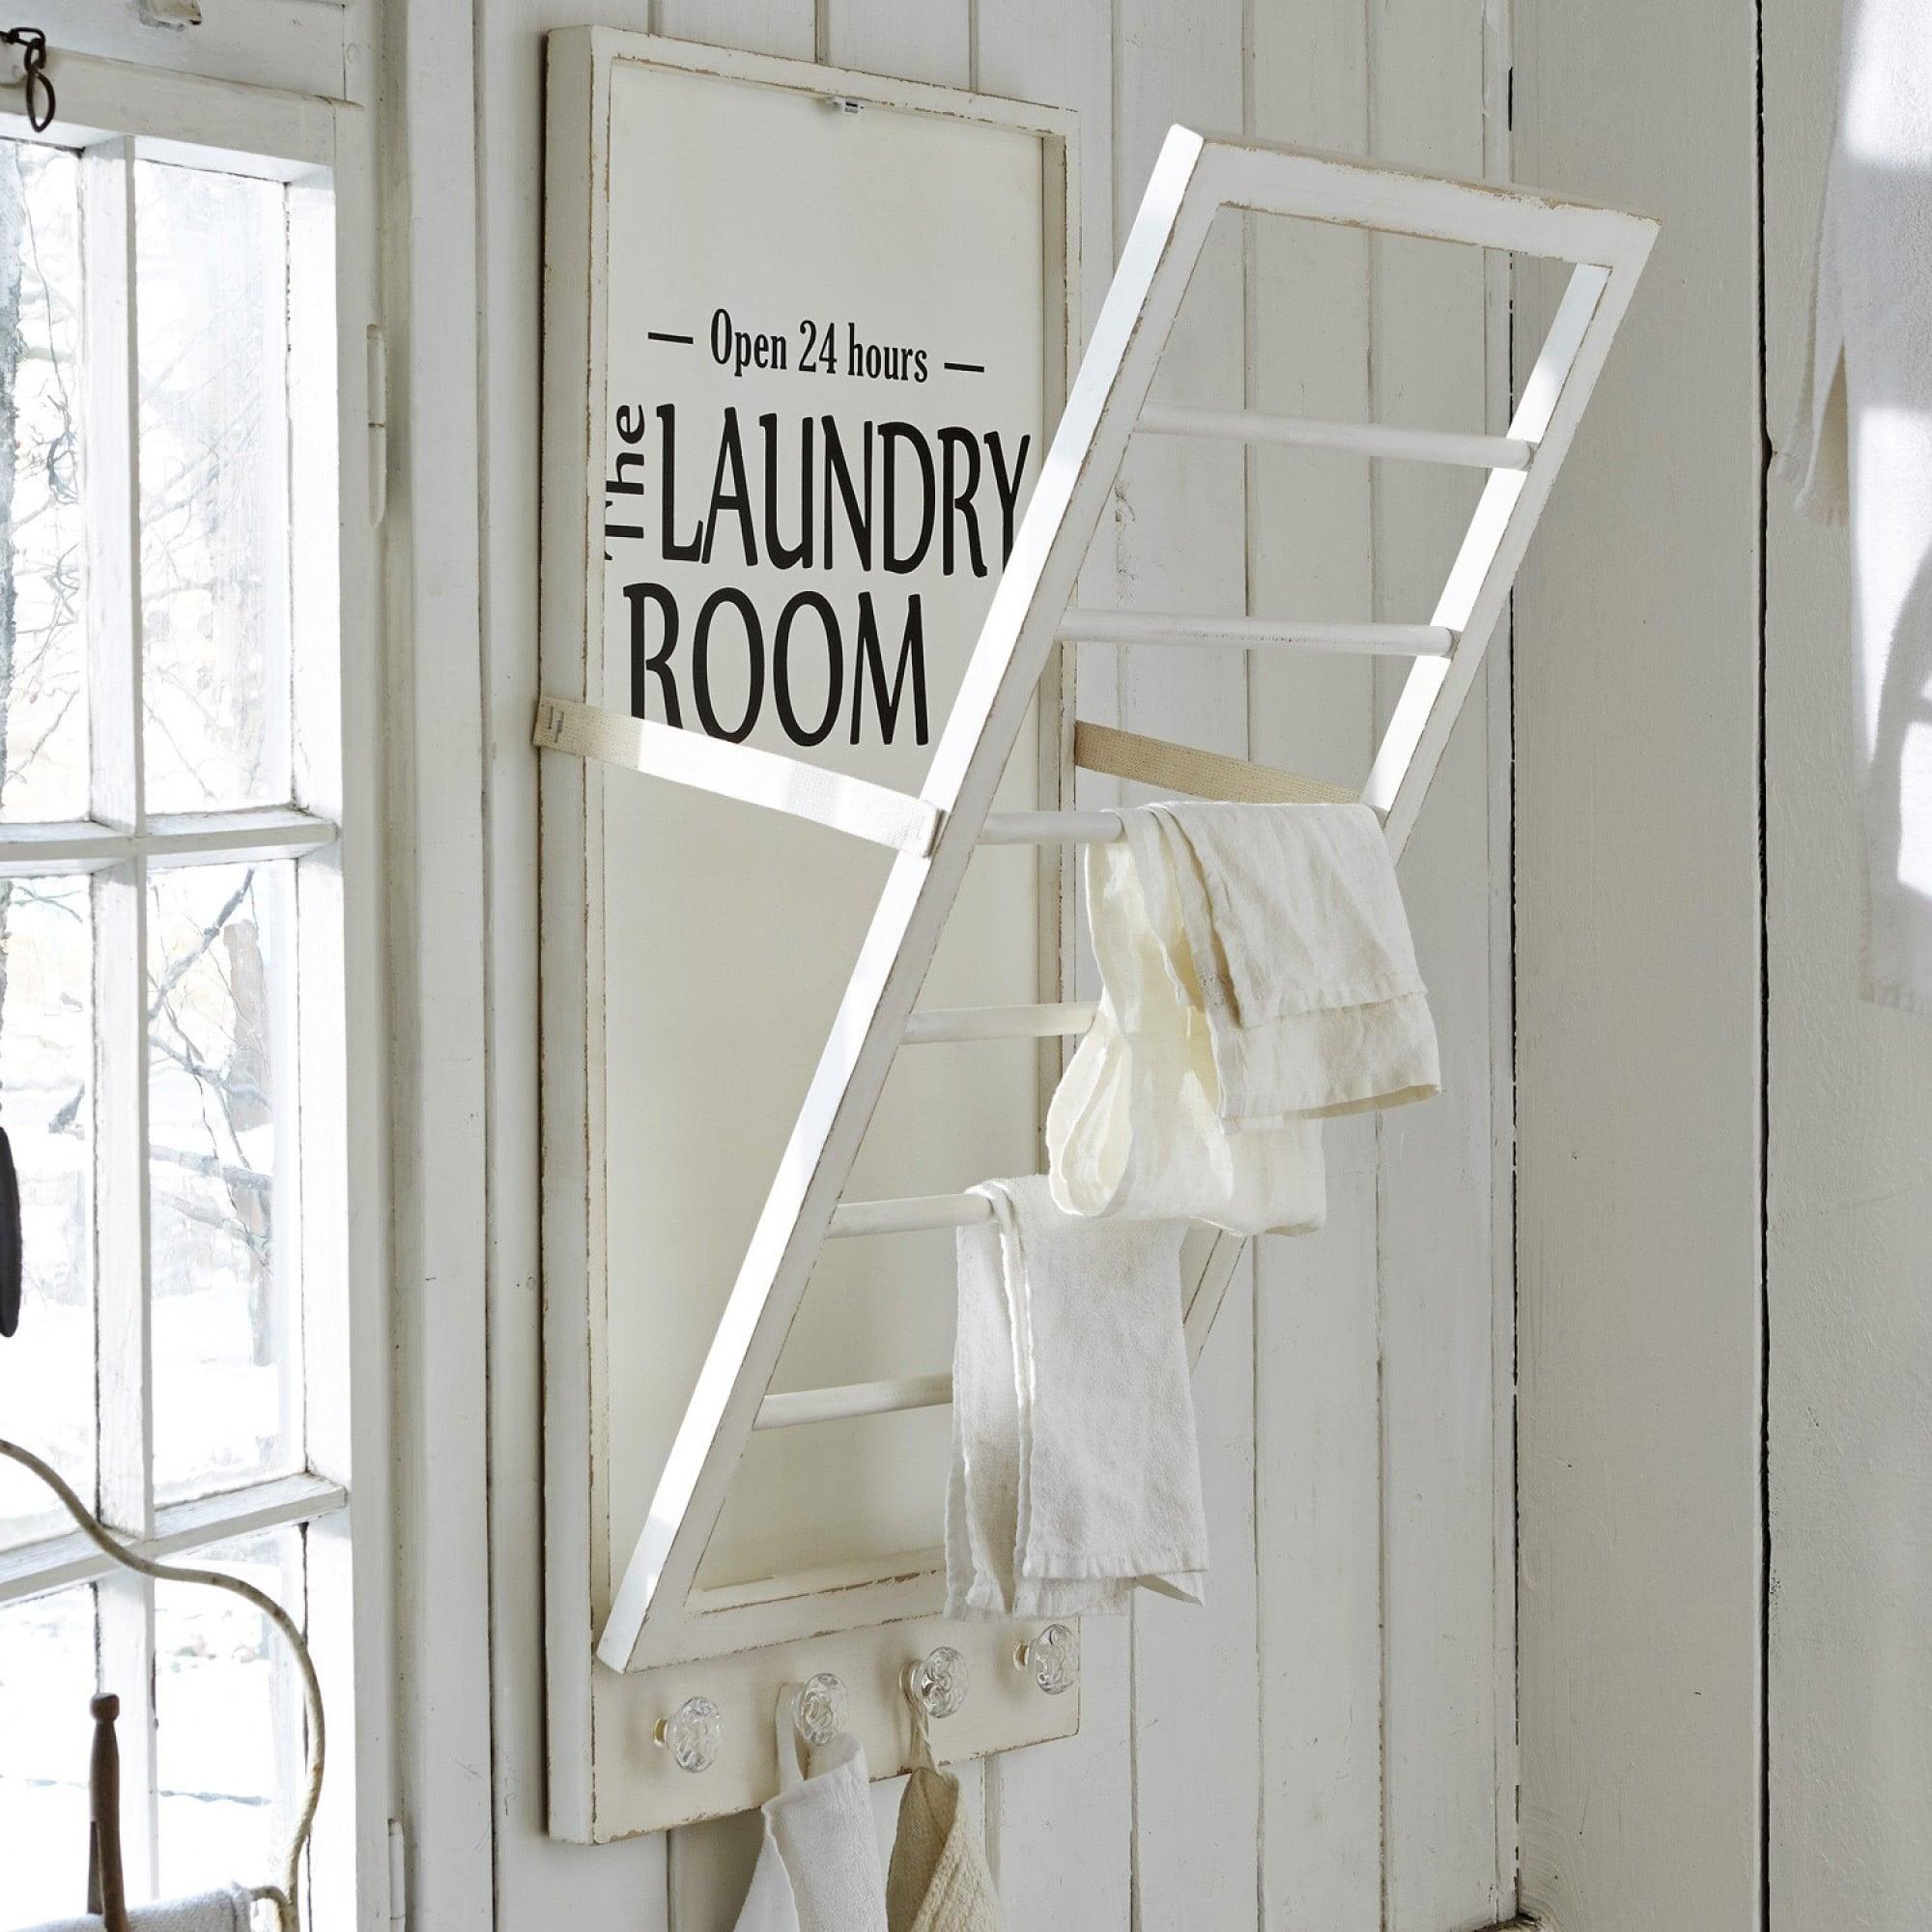 Handtuchhalter laundry room loberon coming home - Handtuchhalter landhausstil ...